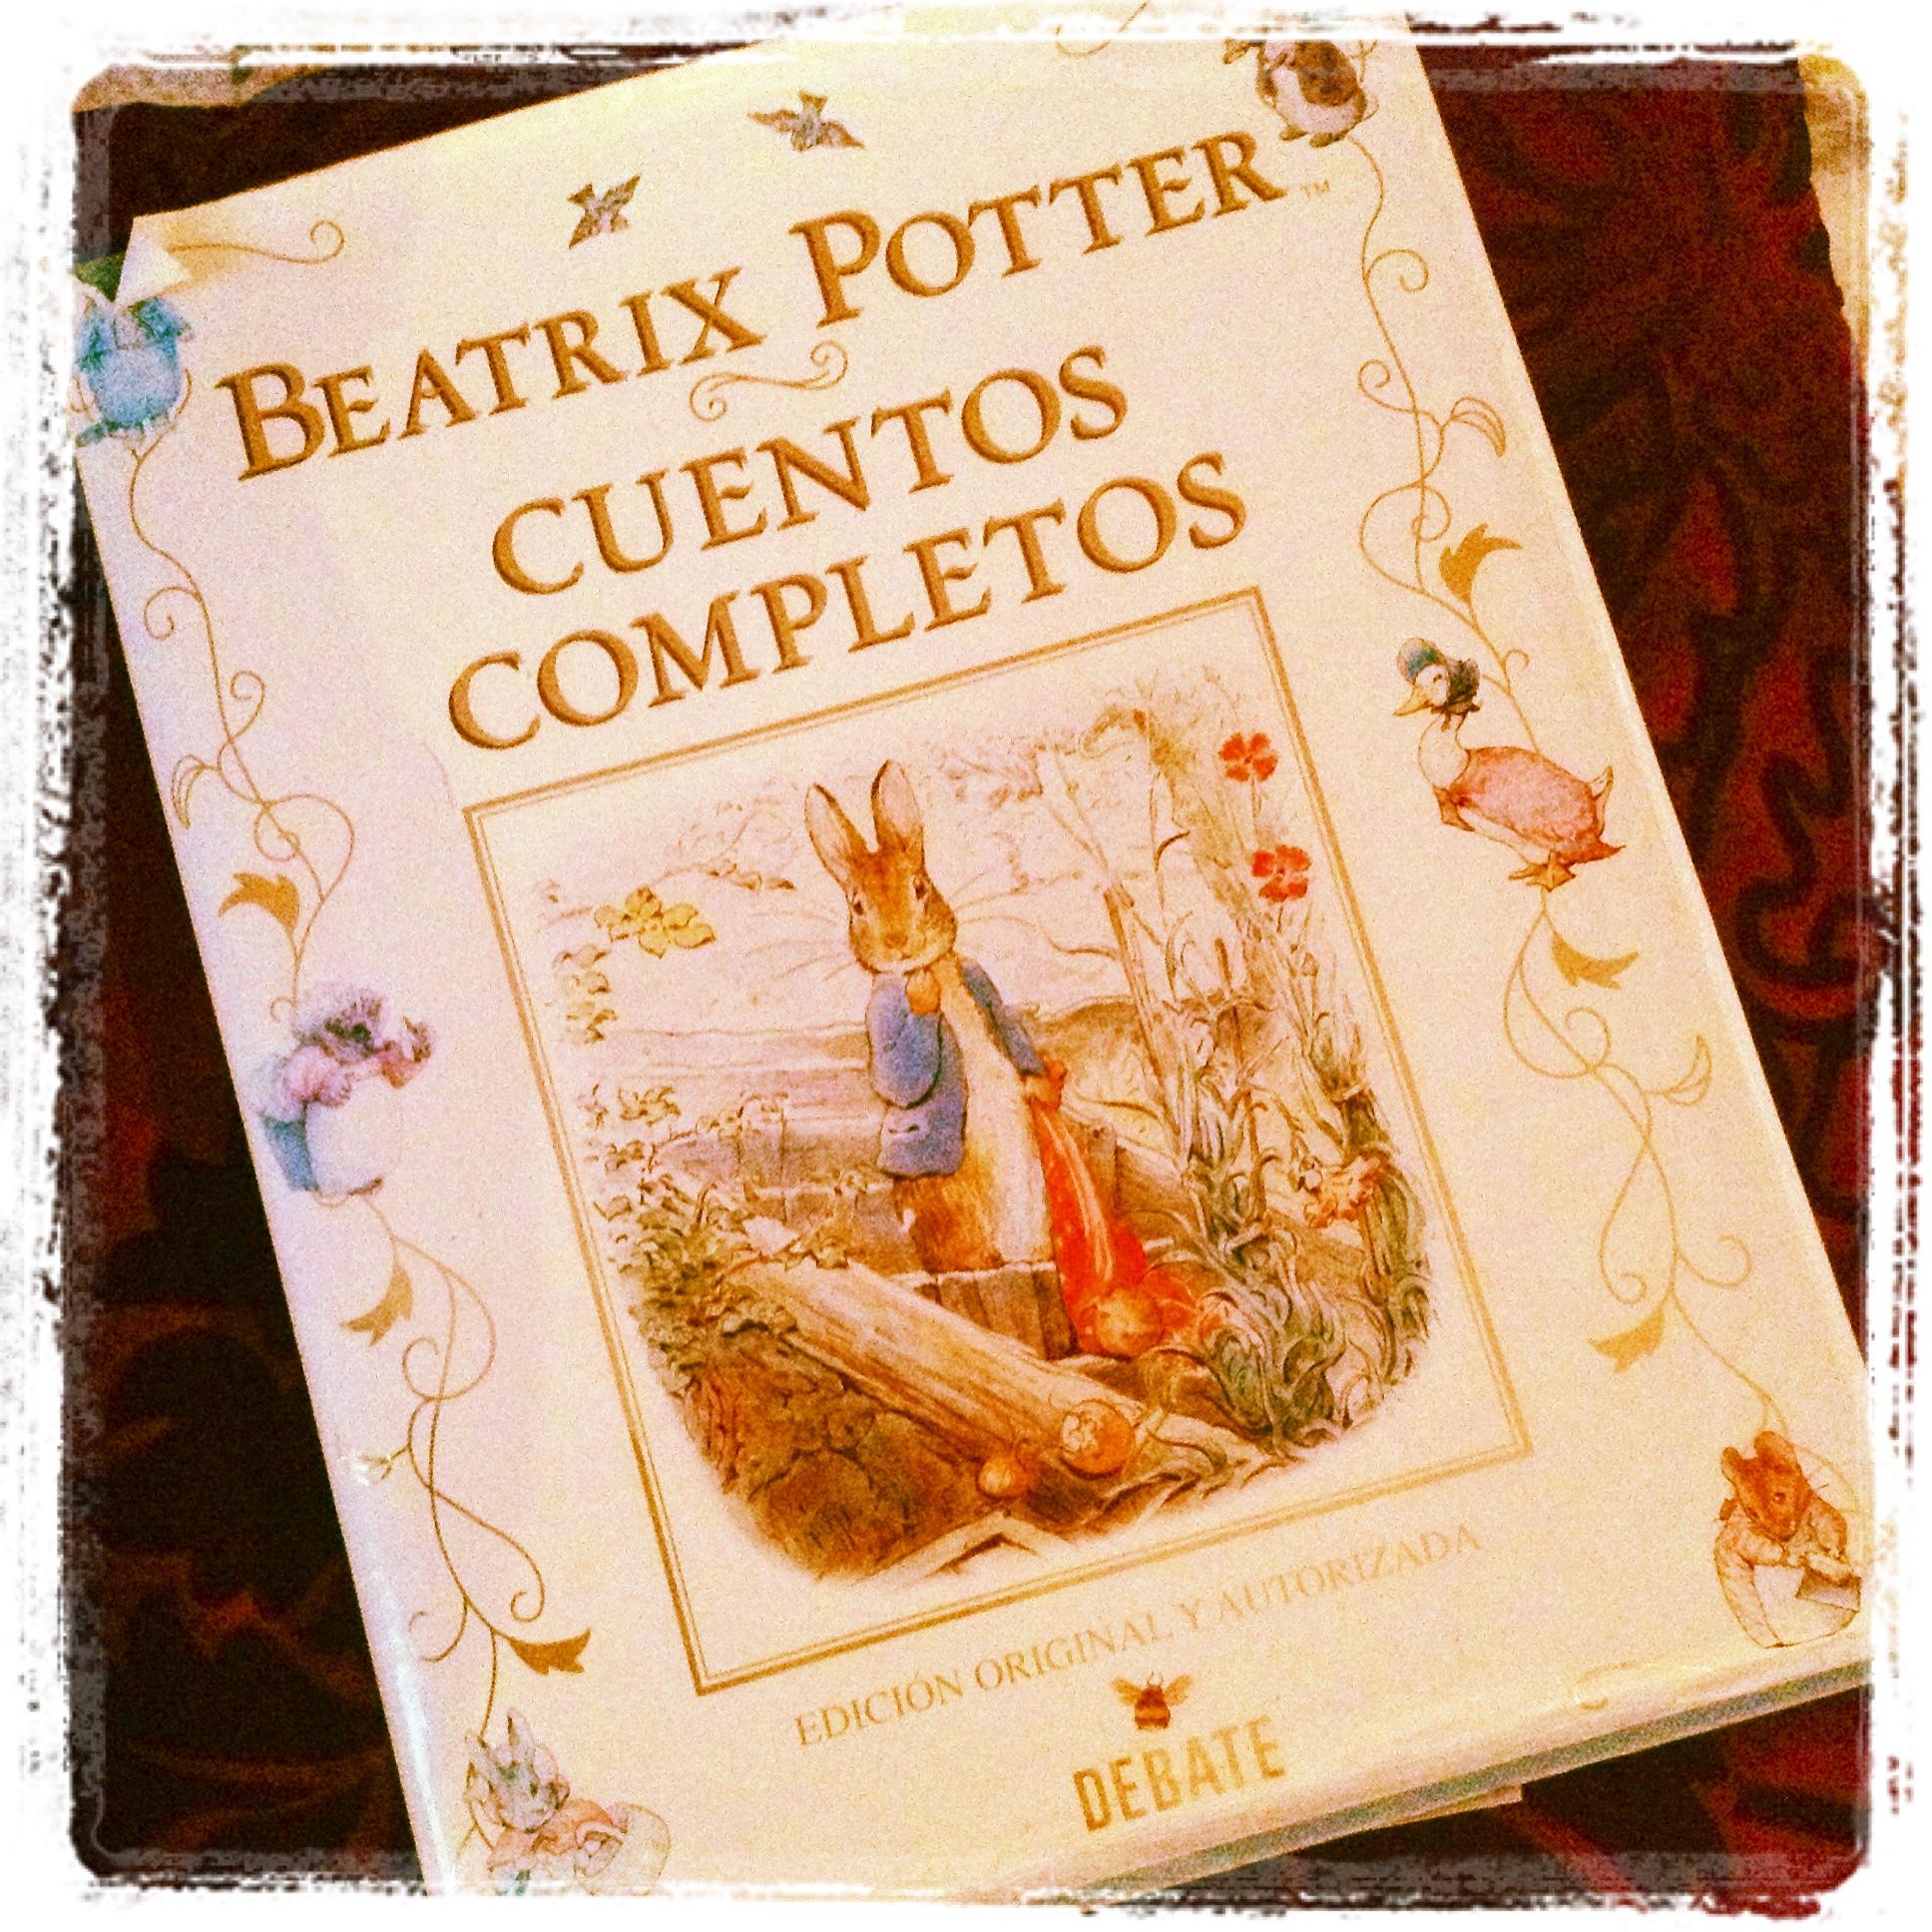 beatrix potter | Yrene Yuhmi's tales